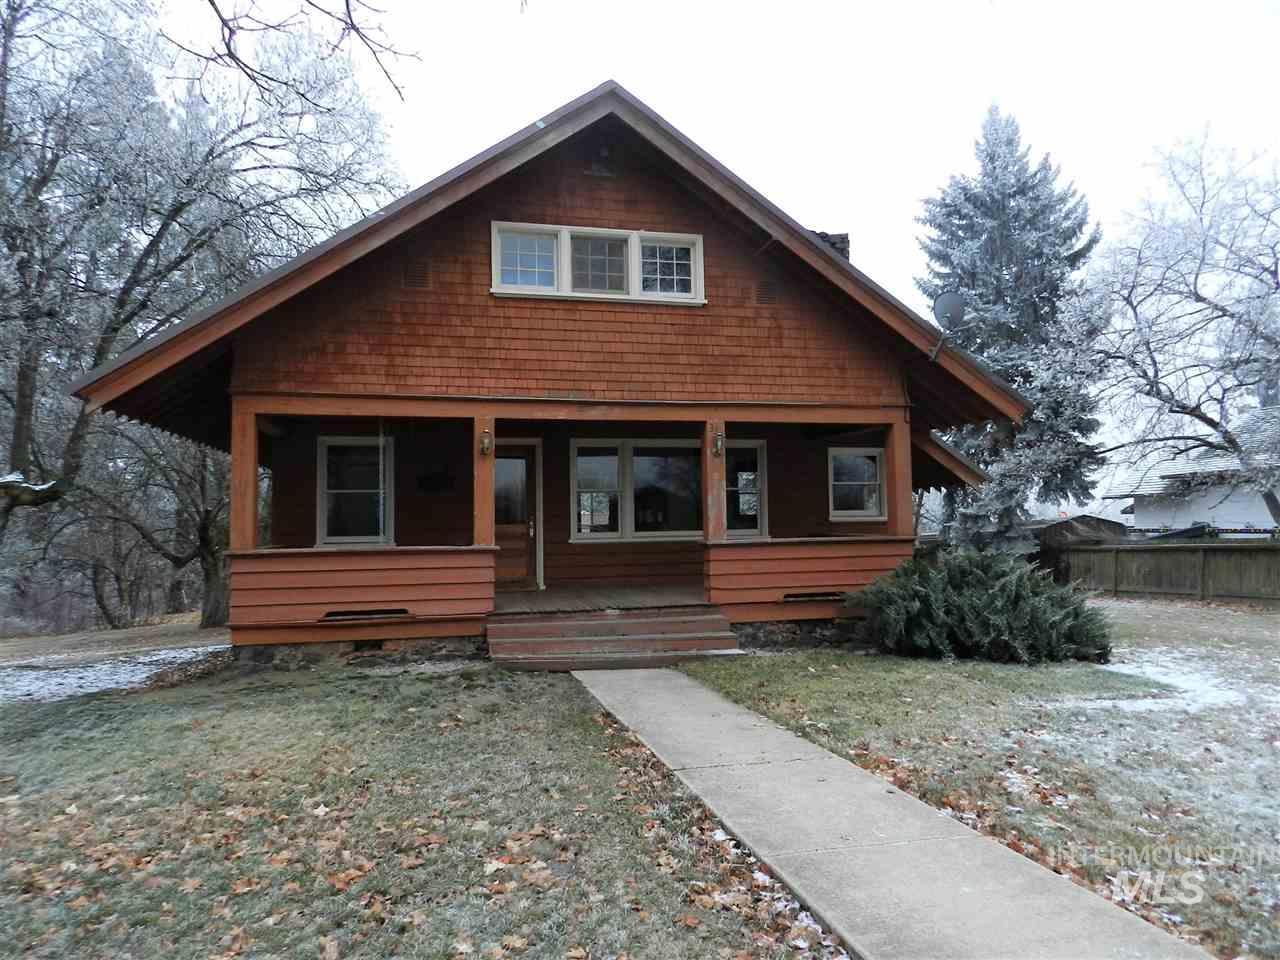 Single Family Home for Sale at 335 Spruce Street 335 Spruce Street Potlatch, Idaho 83855